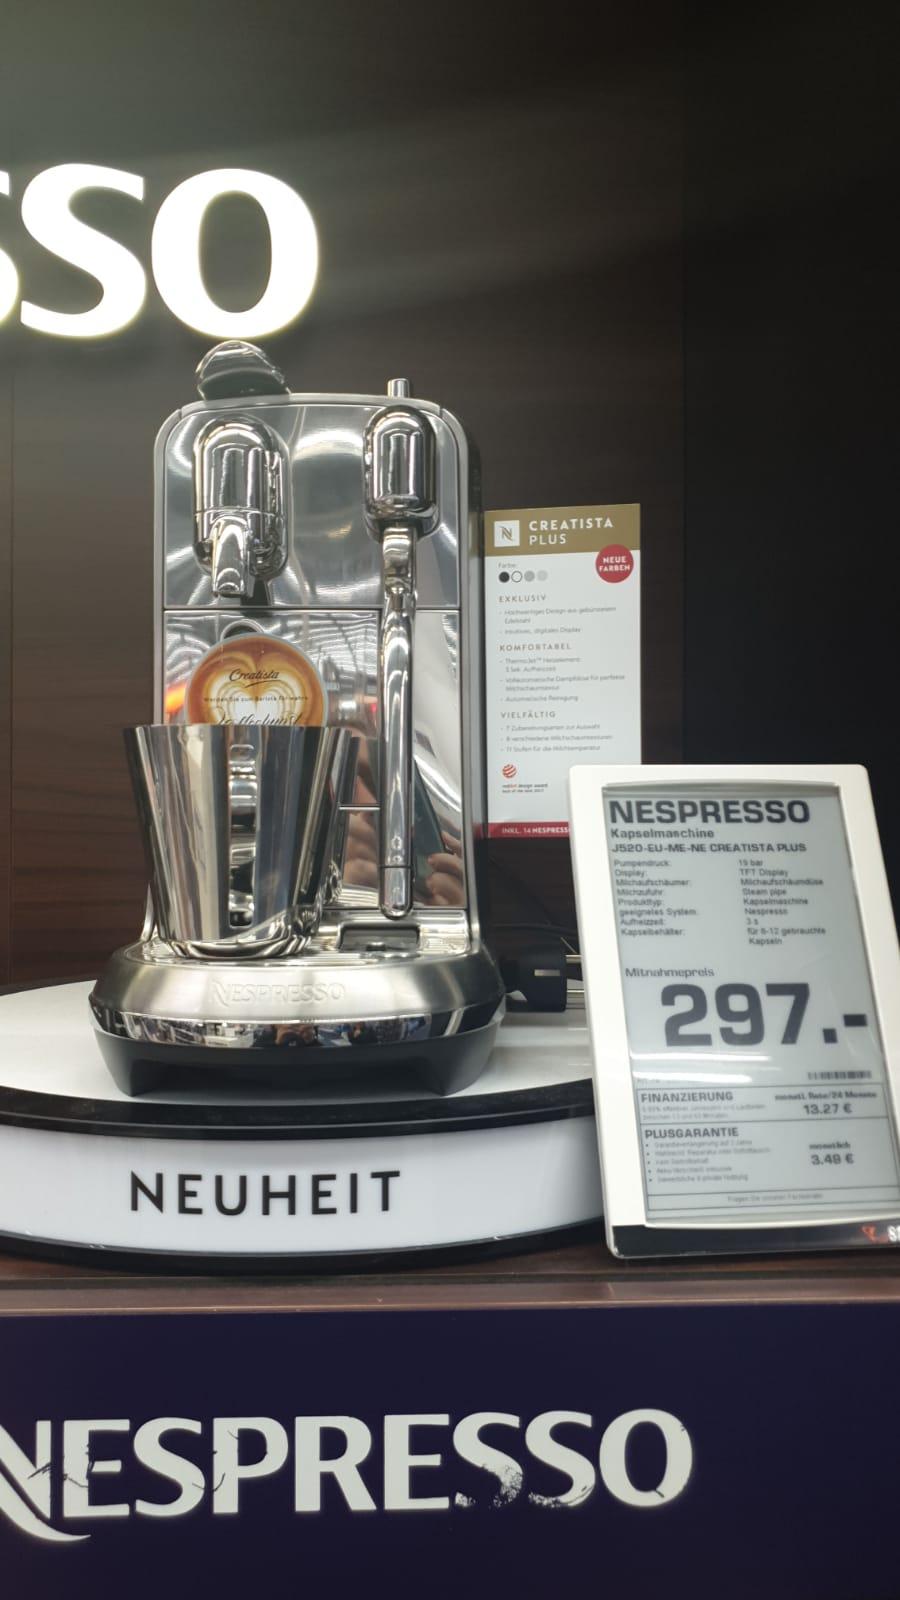 [Lokal] Saturn Heidelberg Innenstadt - Nespresso Creatista Plus stainless steel (J520-EU-ME-NE)